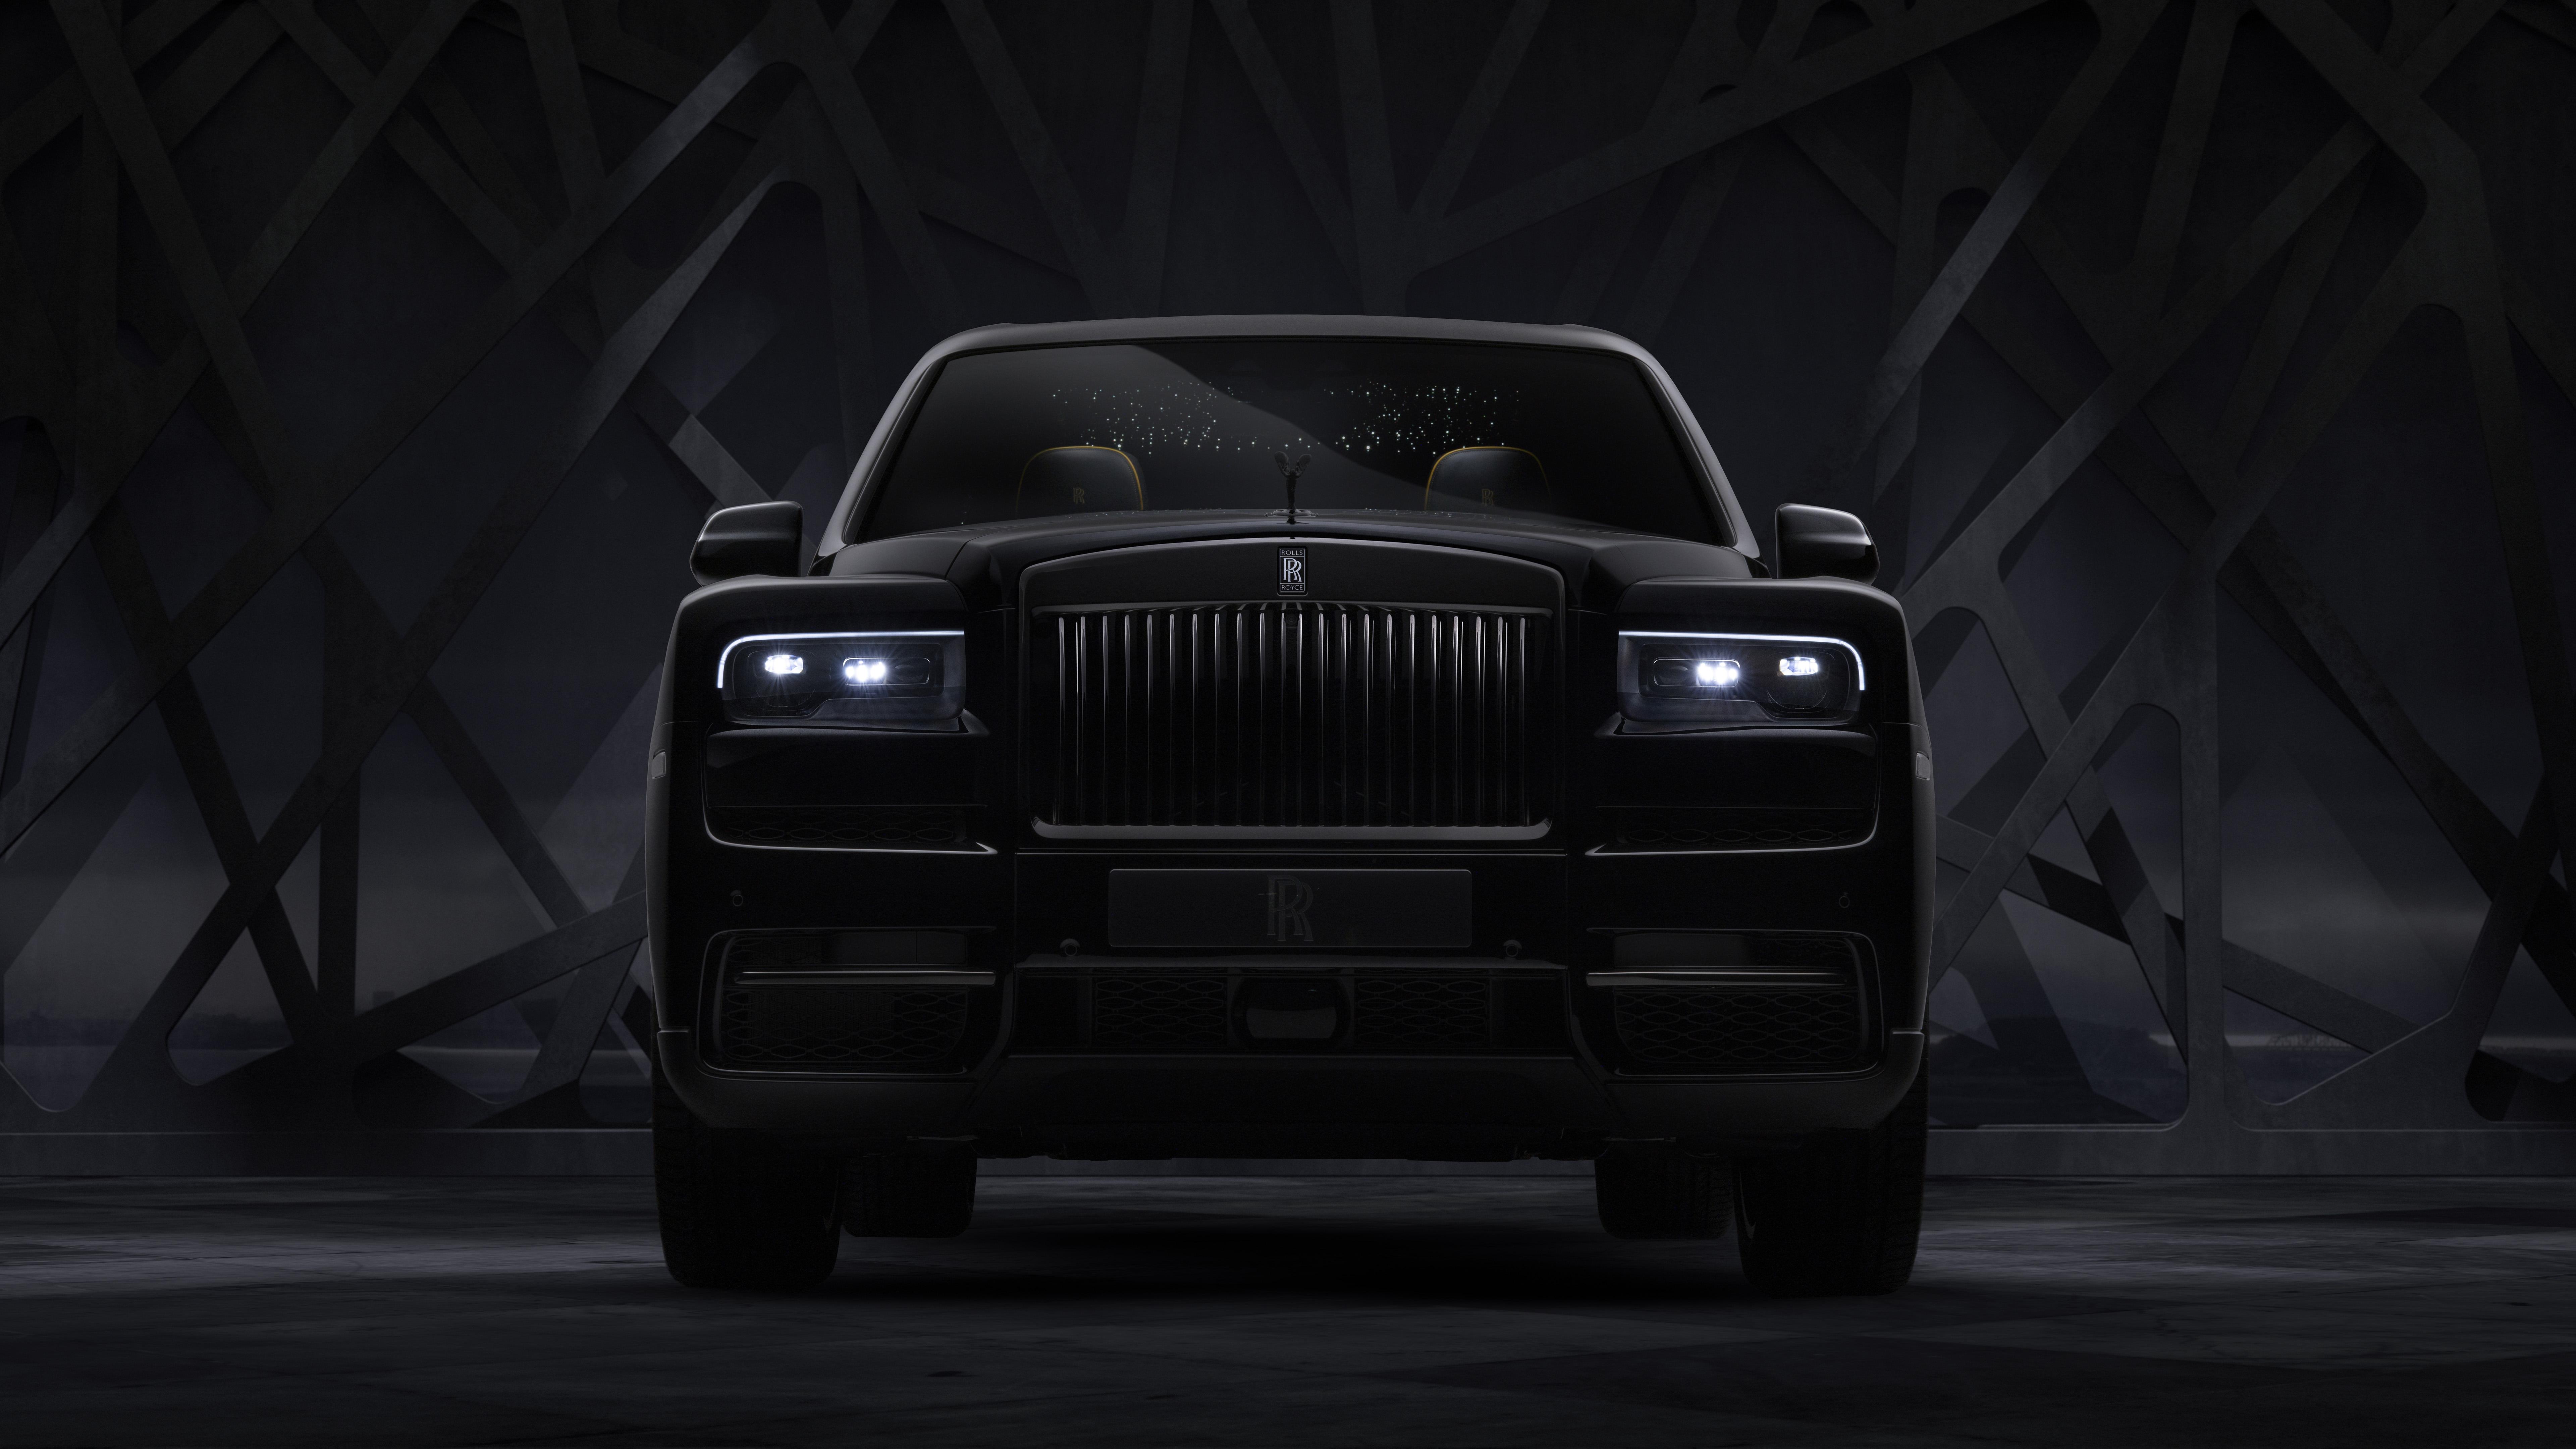 Rolls Royce Cullinan Black Badge 2019 4k 8k Wallpaper Hd Car Wallpapers Id 13647